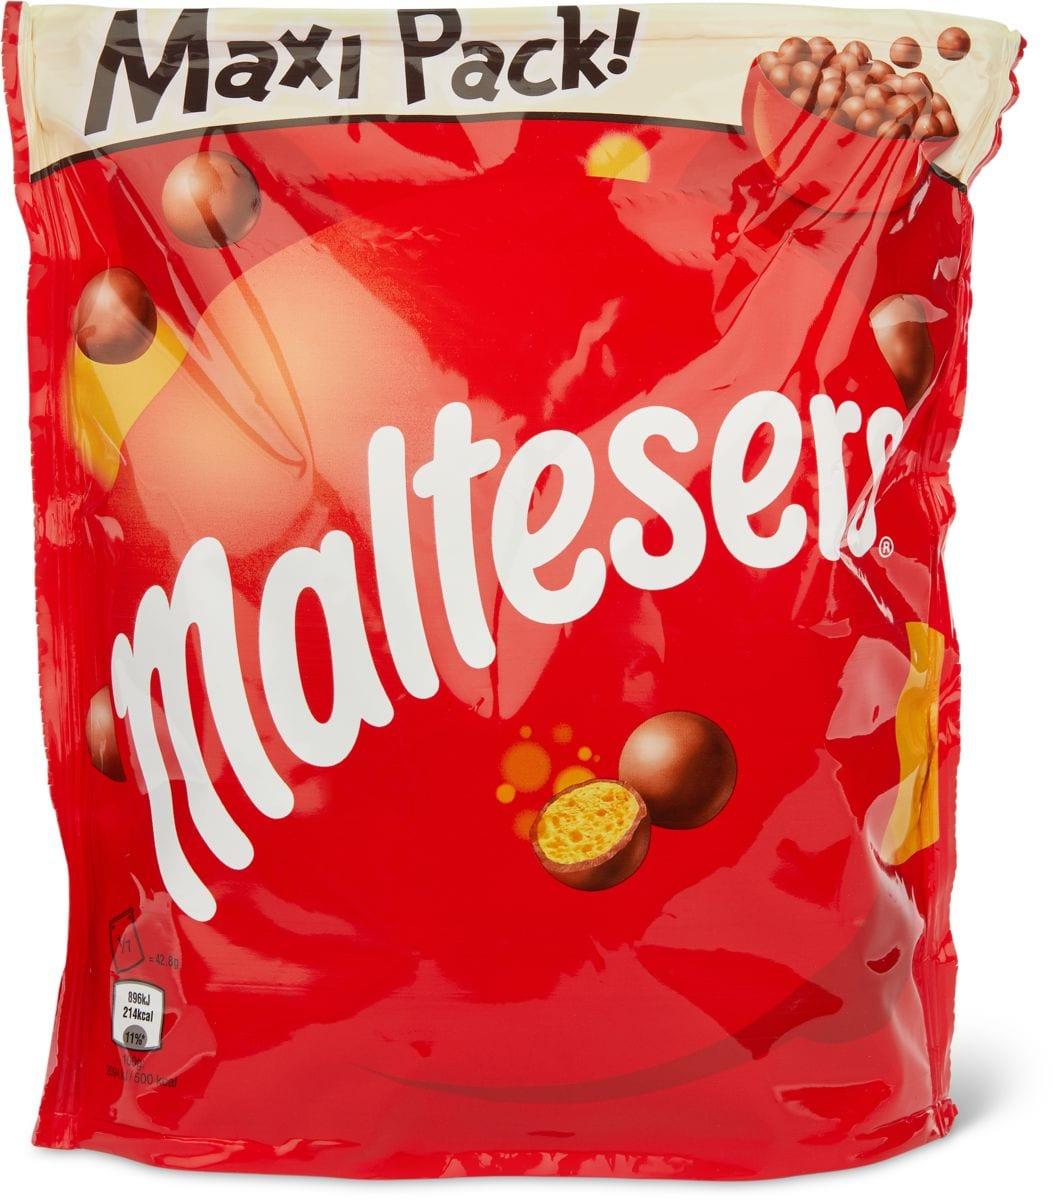 Maltesers Maxi